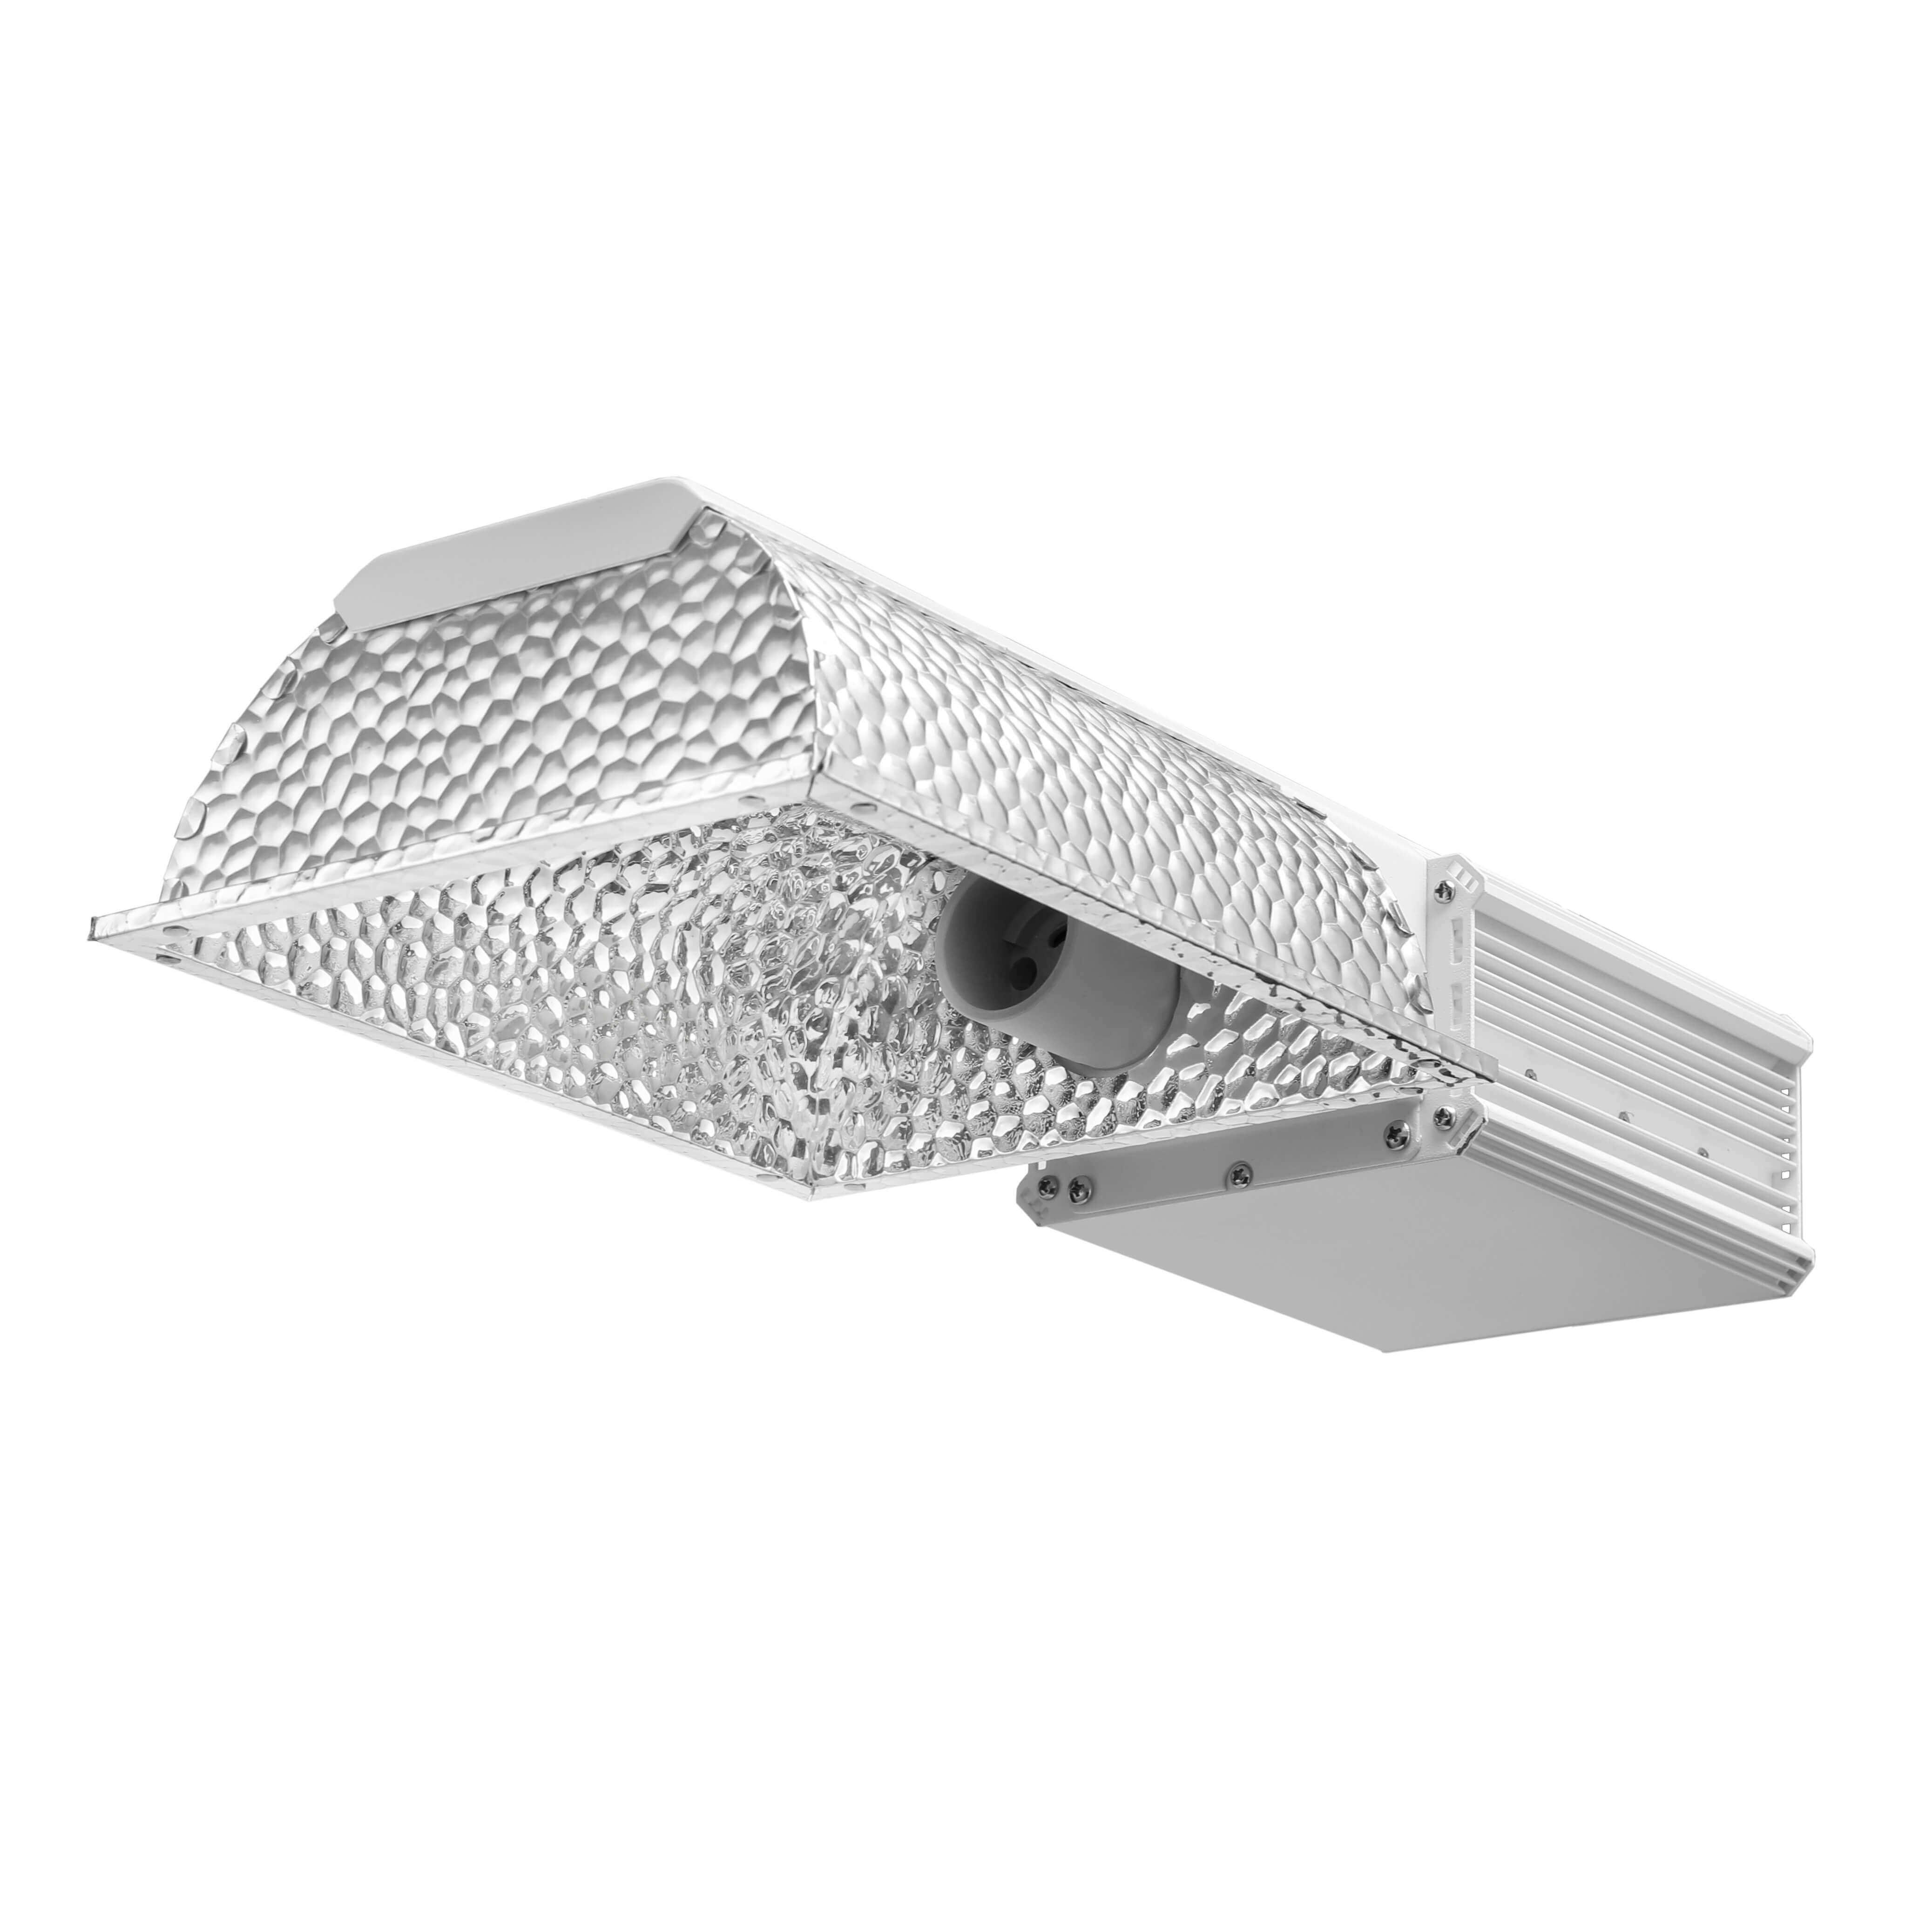 SunStream 315 Watt Ceramic Metal Halide CMH Grow Light System Kits